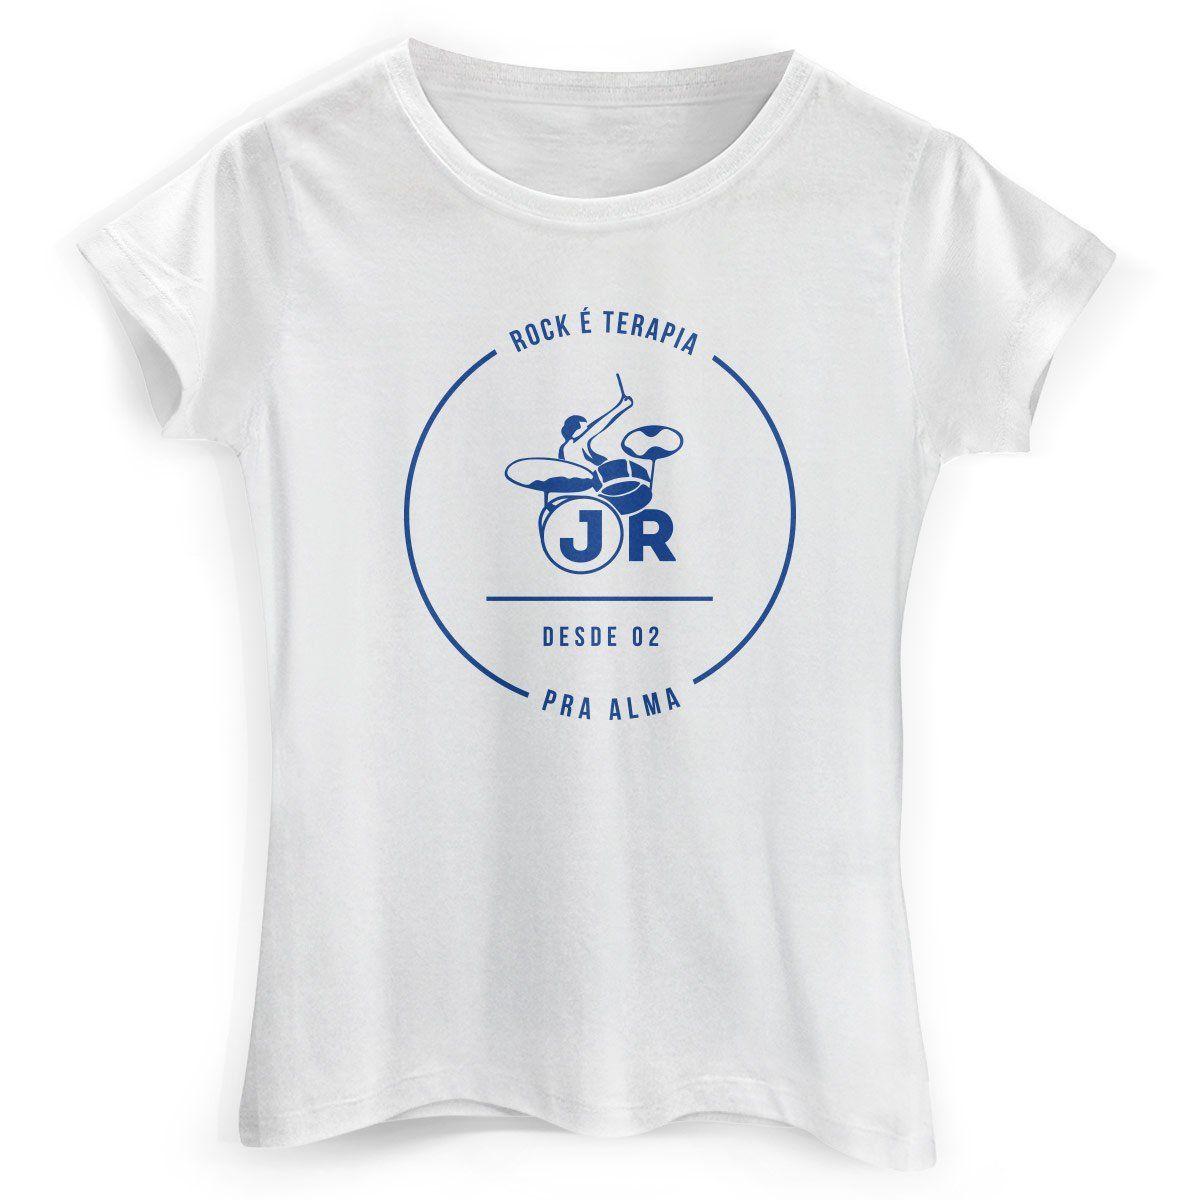 Camiseta Feminina João Rock Rock é Terapia